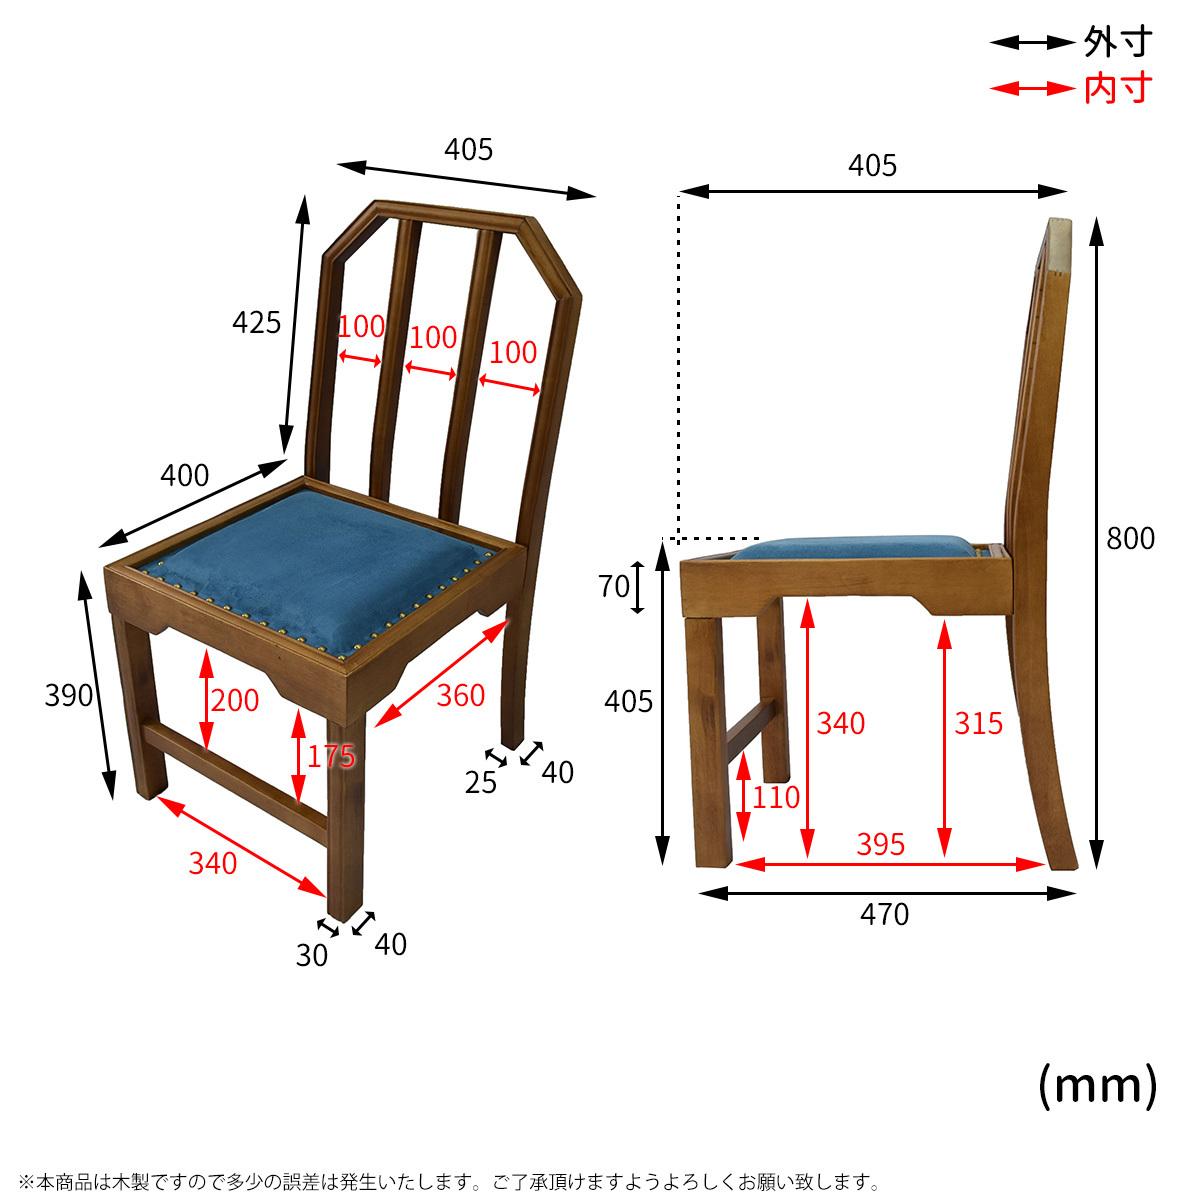 JP Modern Dining Chai RD / 和モダンスタイル 和モダン ダイニングチェア レッド